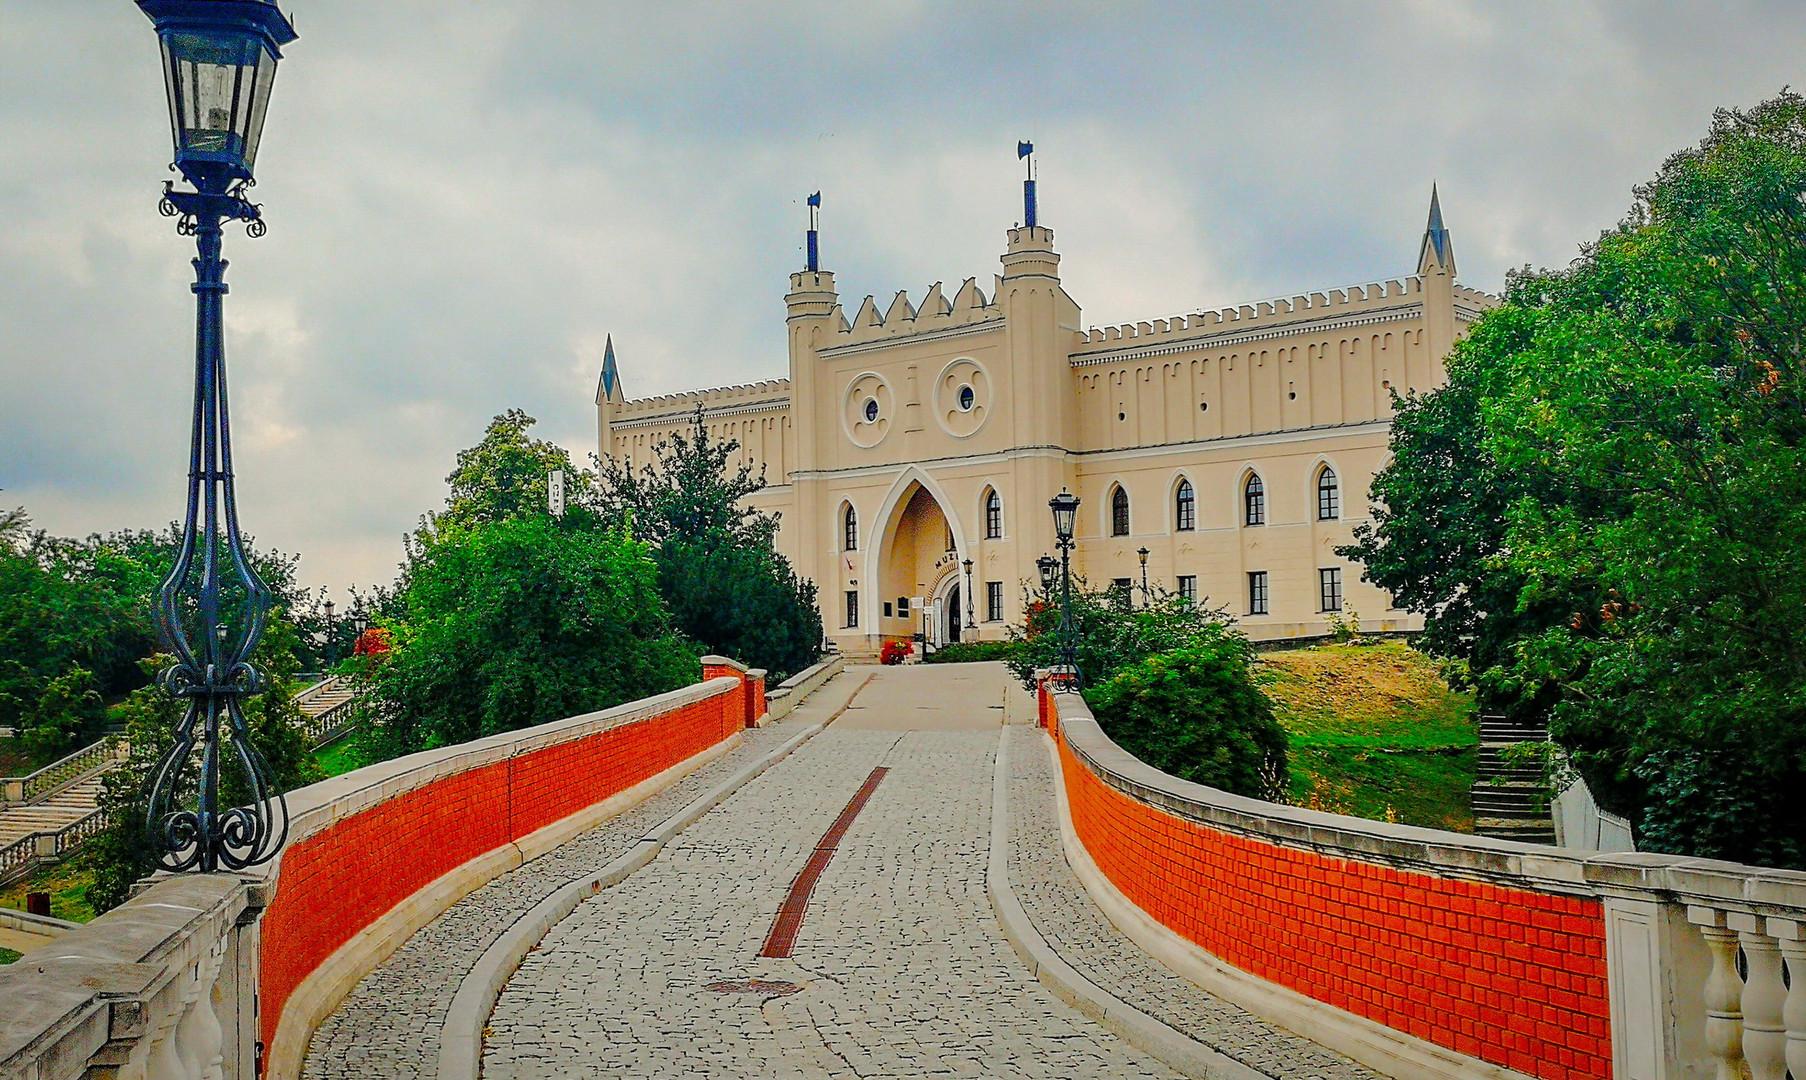 Люблинский замок, Люблин